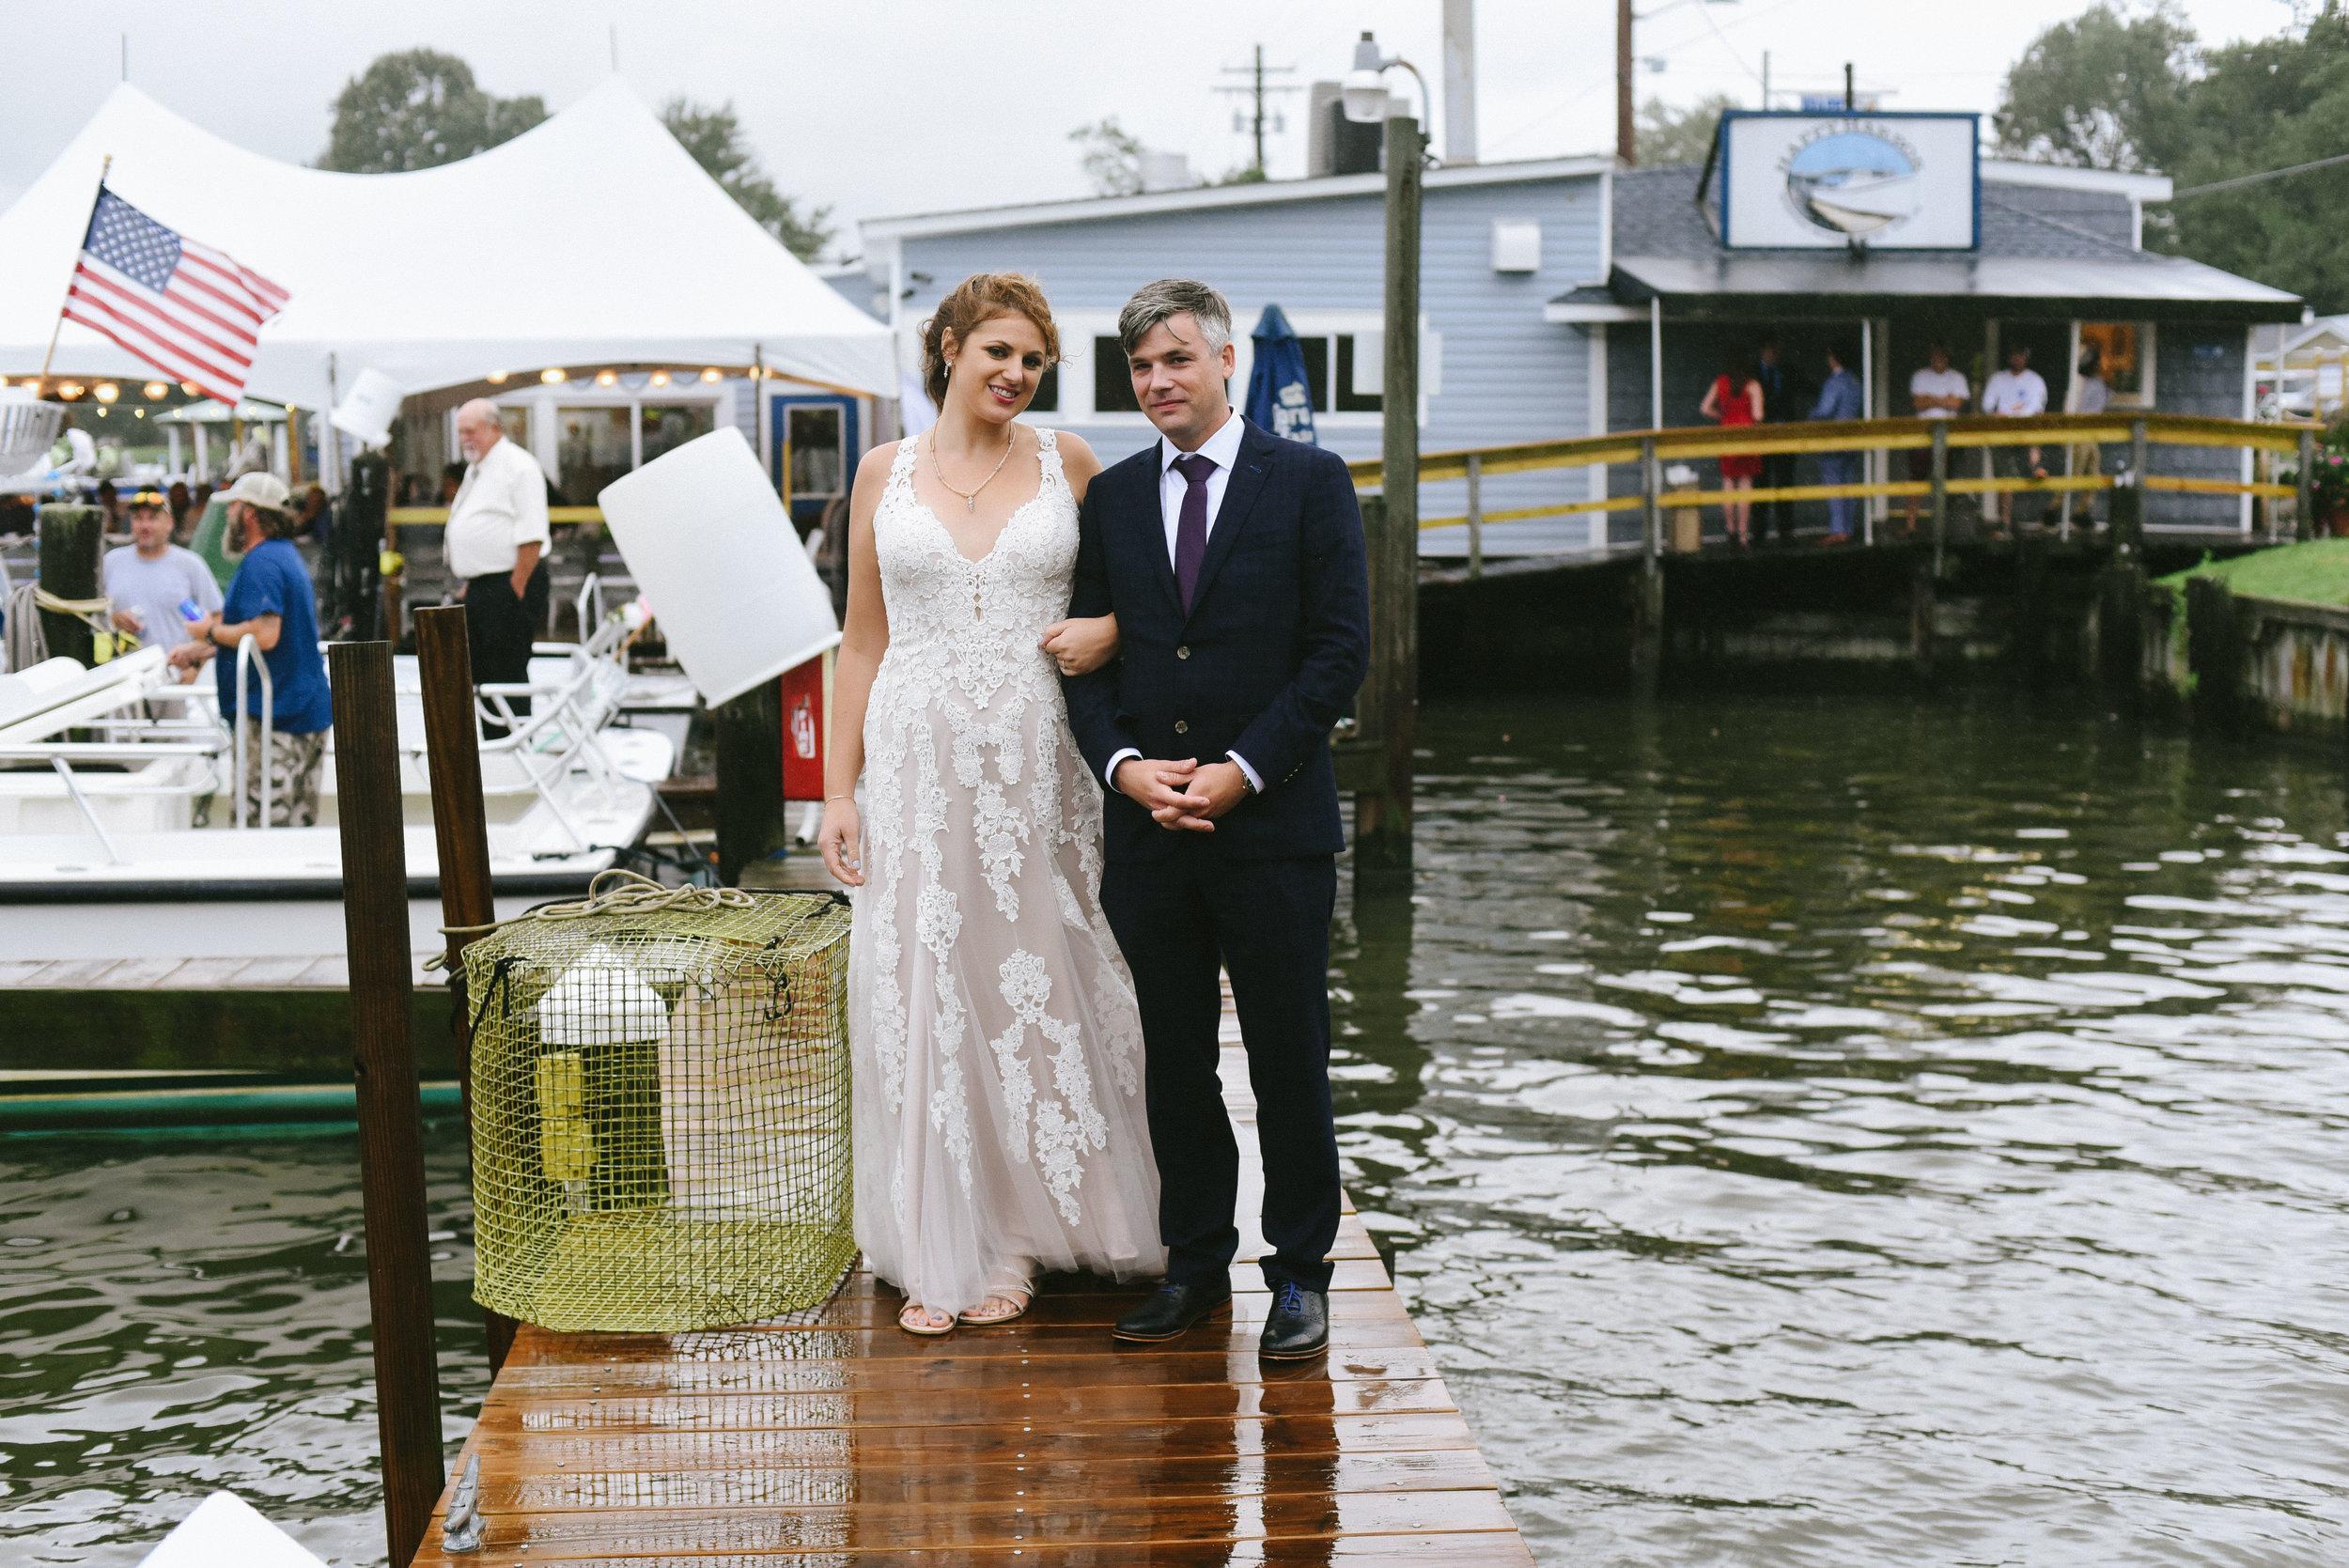 happy_harbor_deale_wedding_sneak_peek-4.jpg